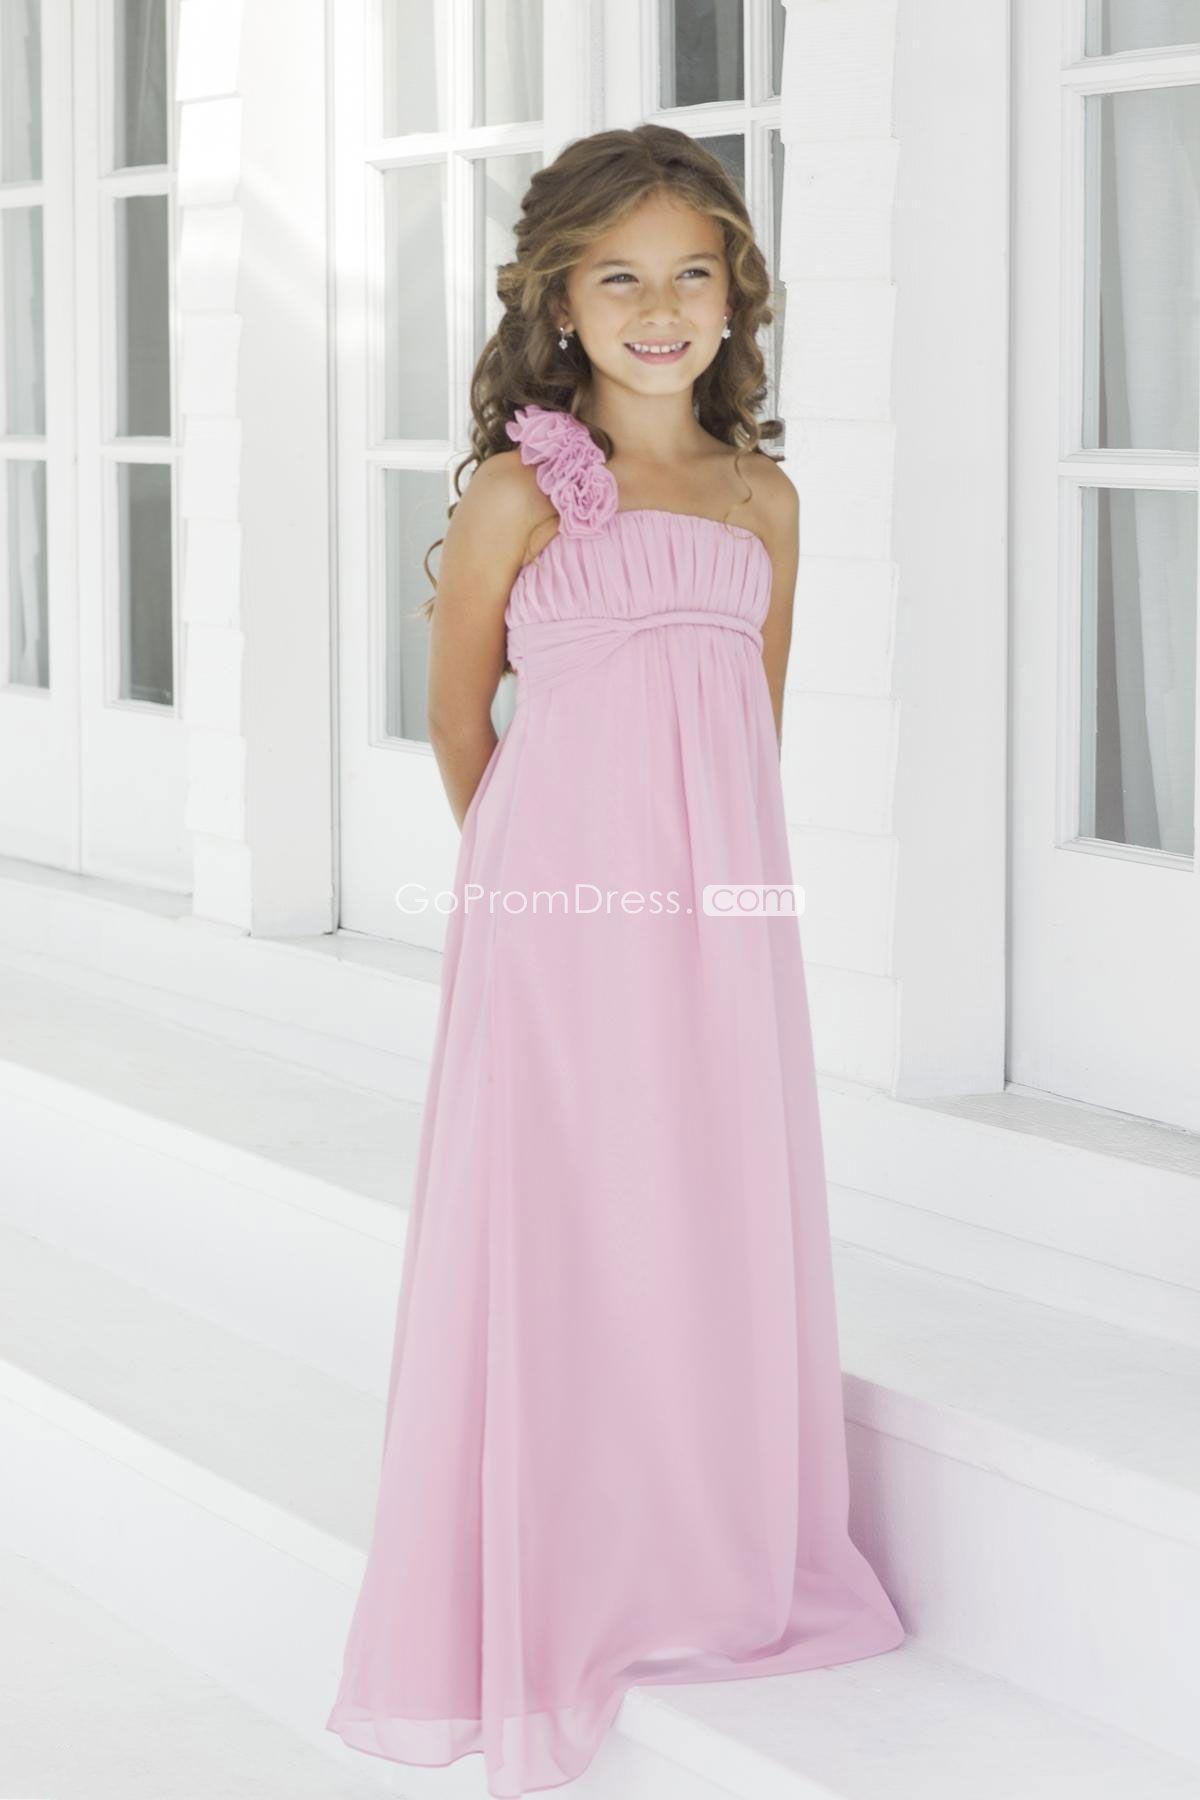 Chiffon Flowers One Shoulder long Junior Bridesmaid Dress picture 1 ...